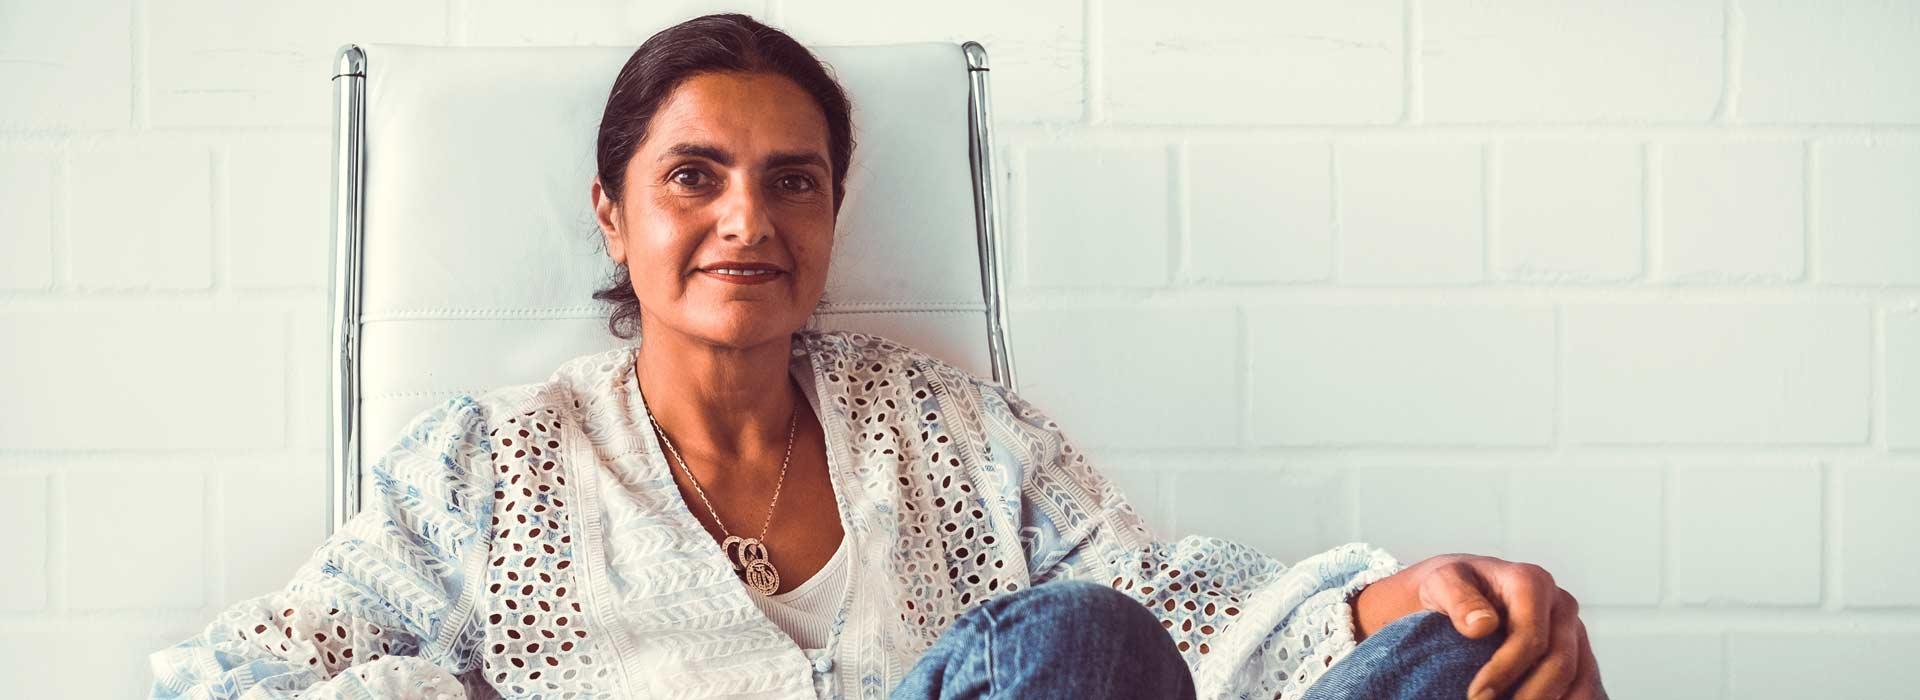 Leyla Piedayesh über Mode, Mut und Entrepreneurship